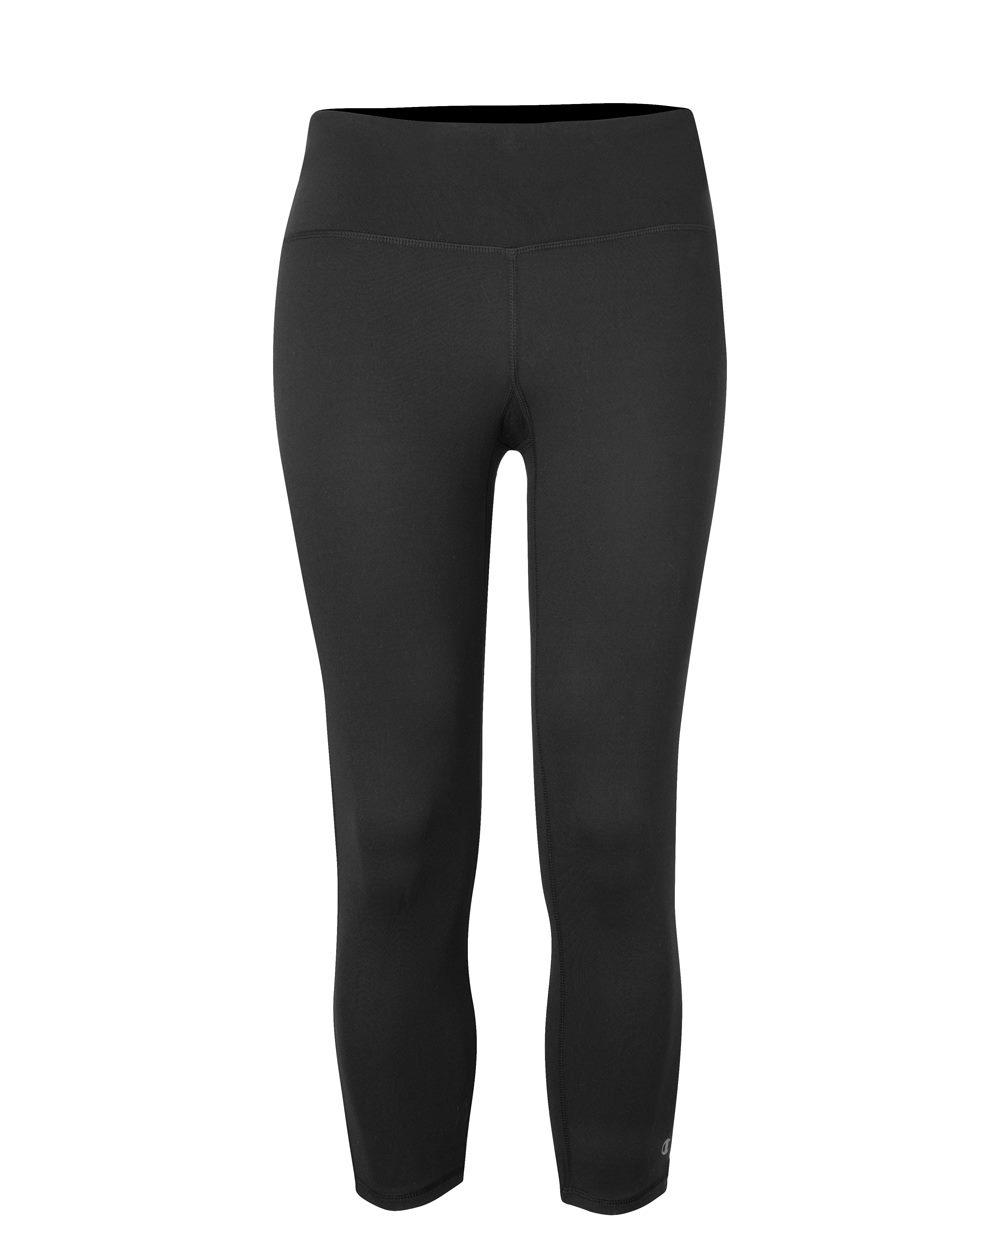 Hampion B960 - Women's Performance Capri Leggings